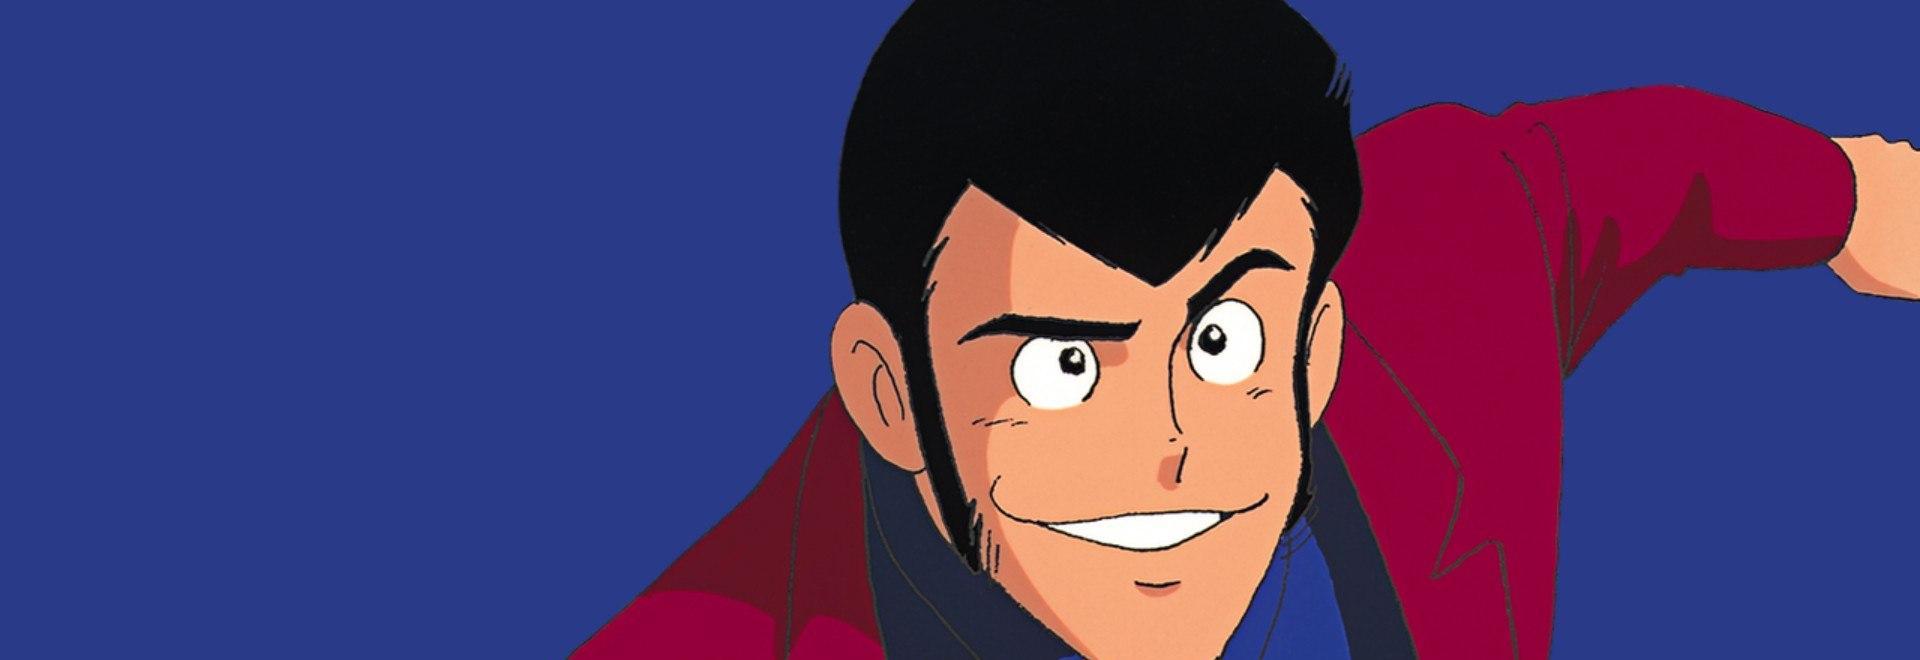 Auto blindata sfida Lupin